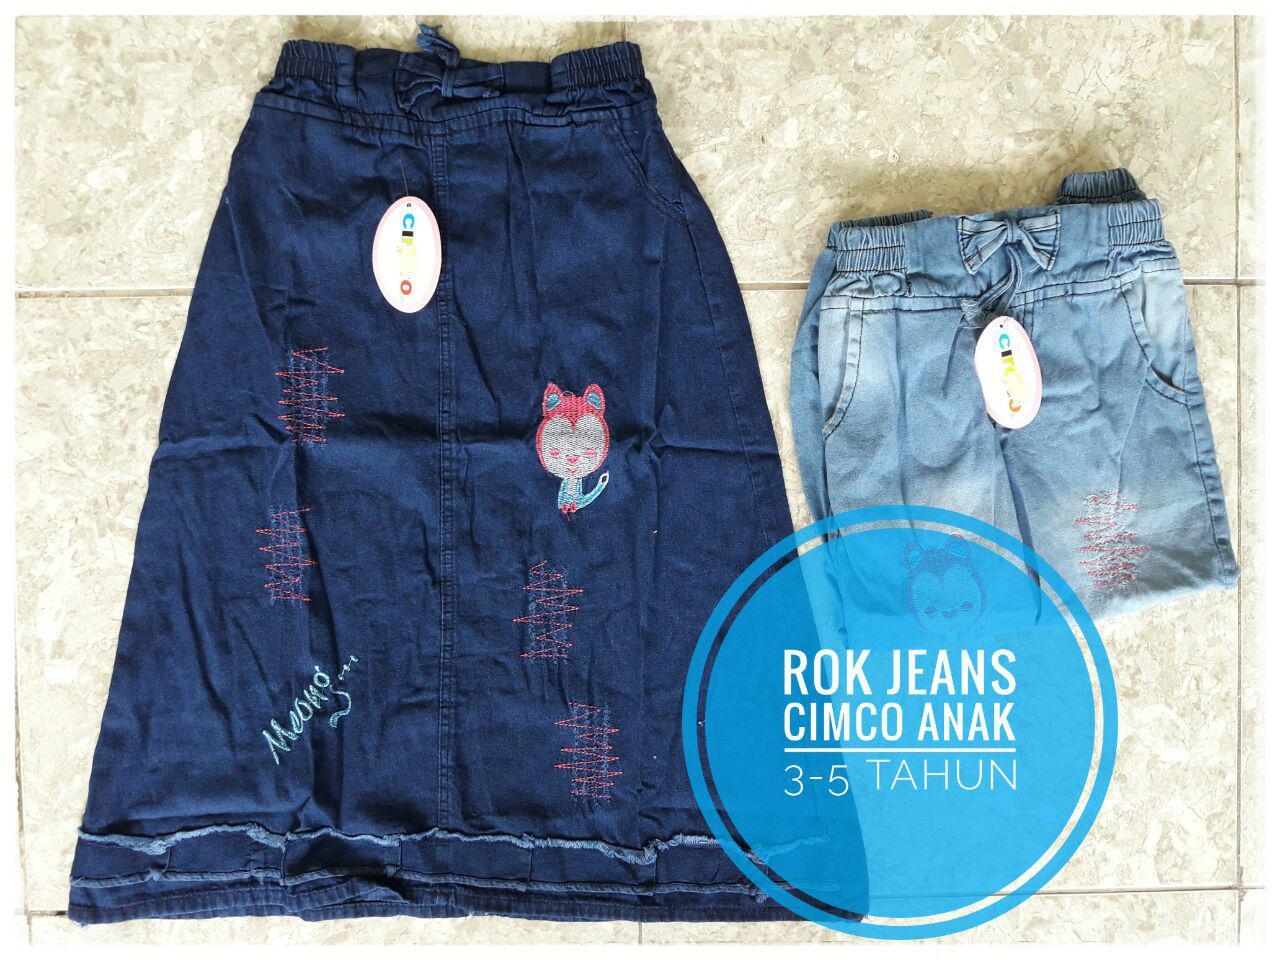 distribautor rok jeans anak murah